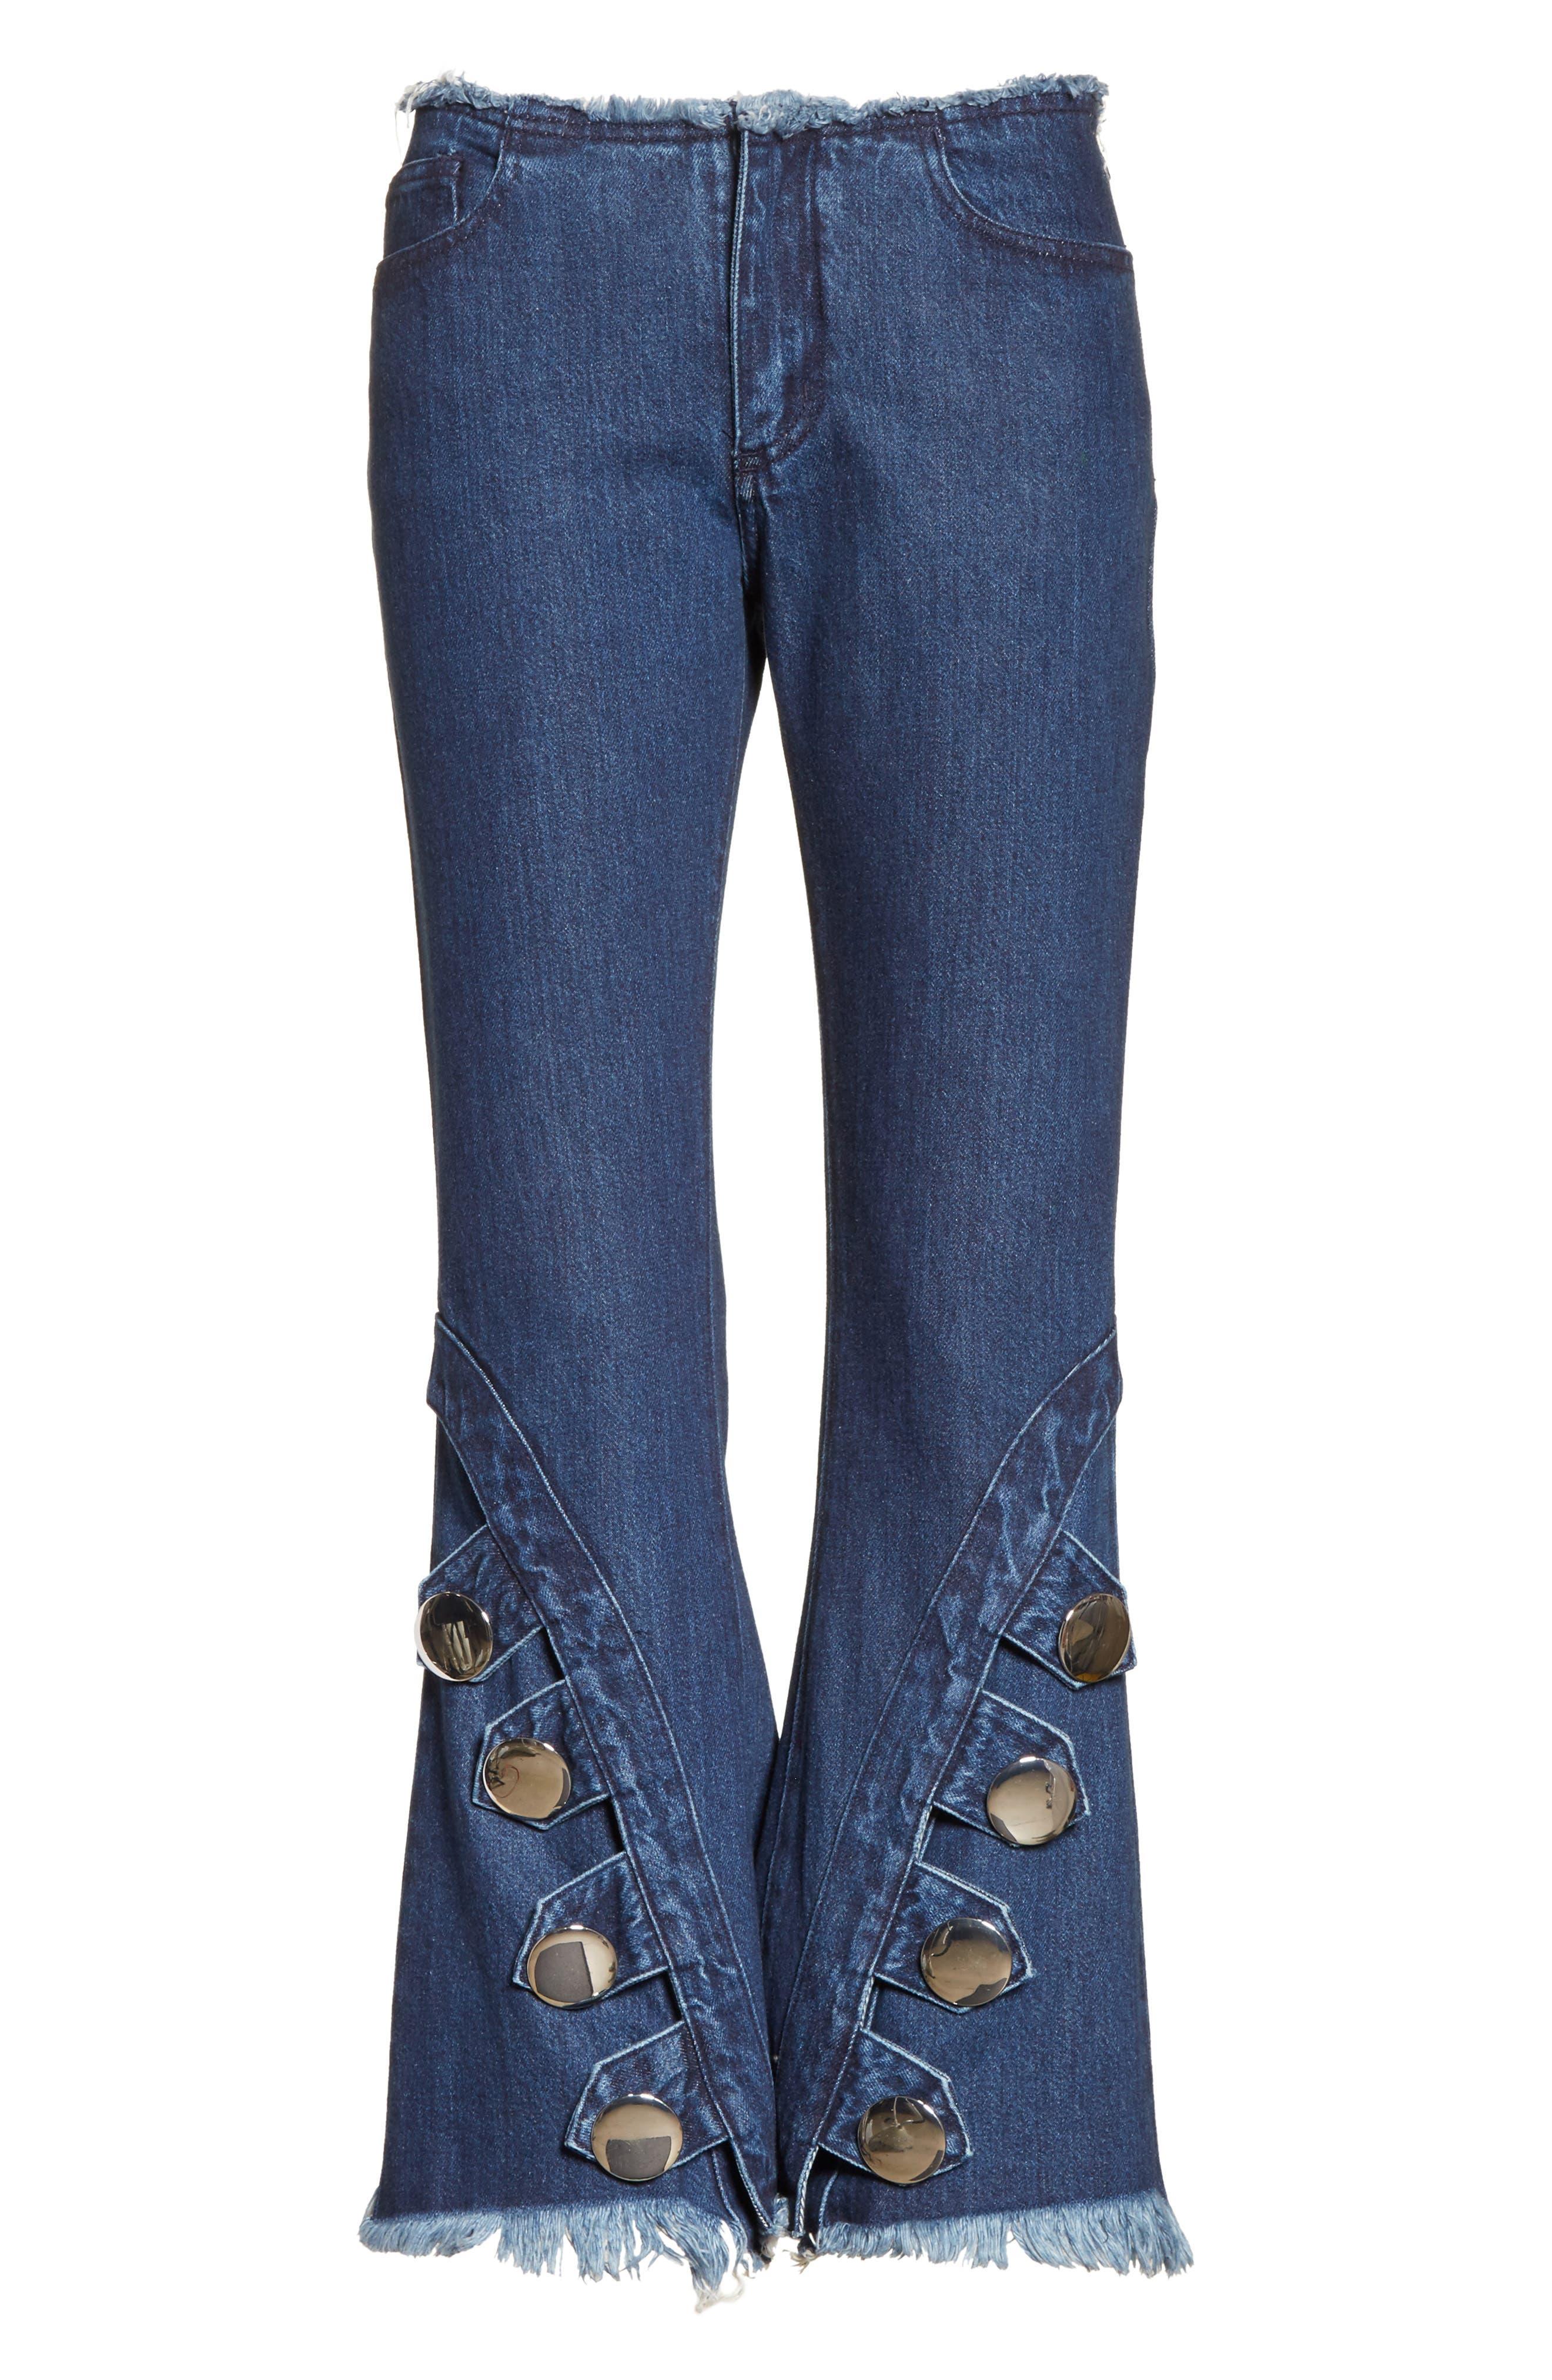 Marques'Almeida Button Trim Crop Flare Jeans,                             Alternate thumbnail 7, color,                             Indigo